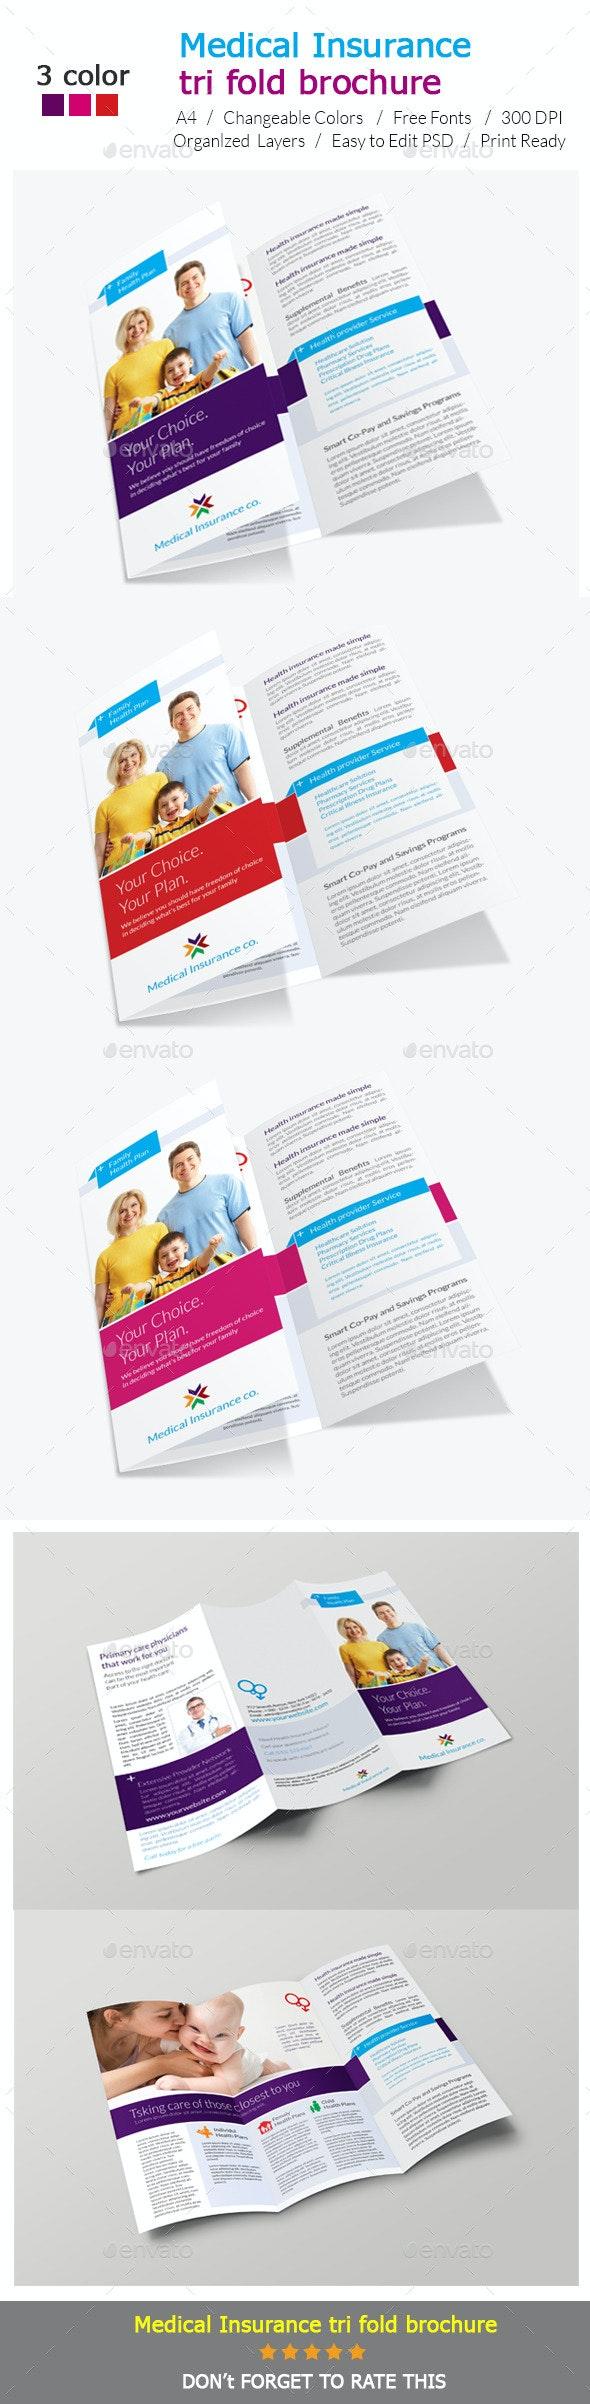 Medical Insurance Tri-Fold brochure Design - Corporate Brochures